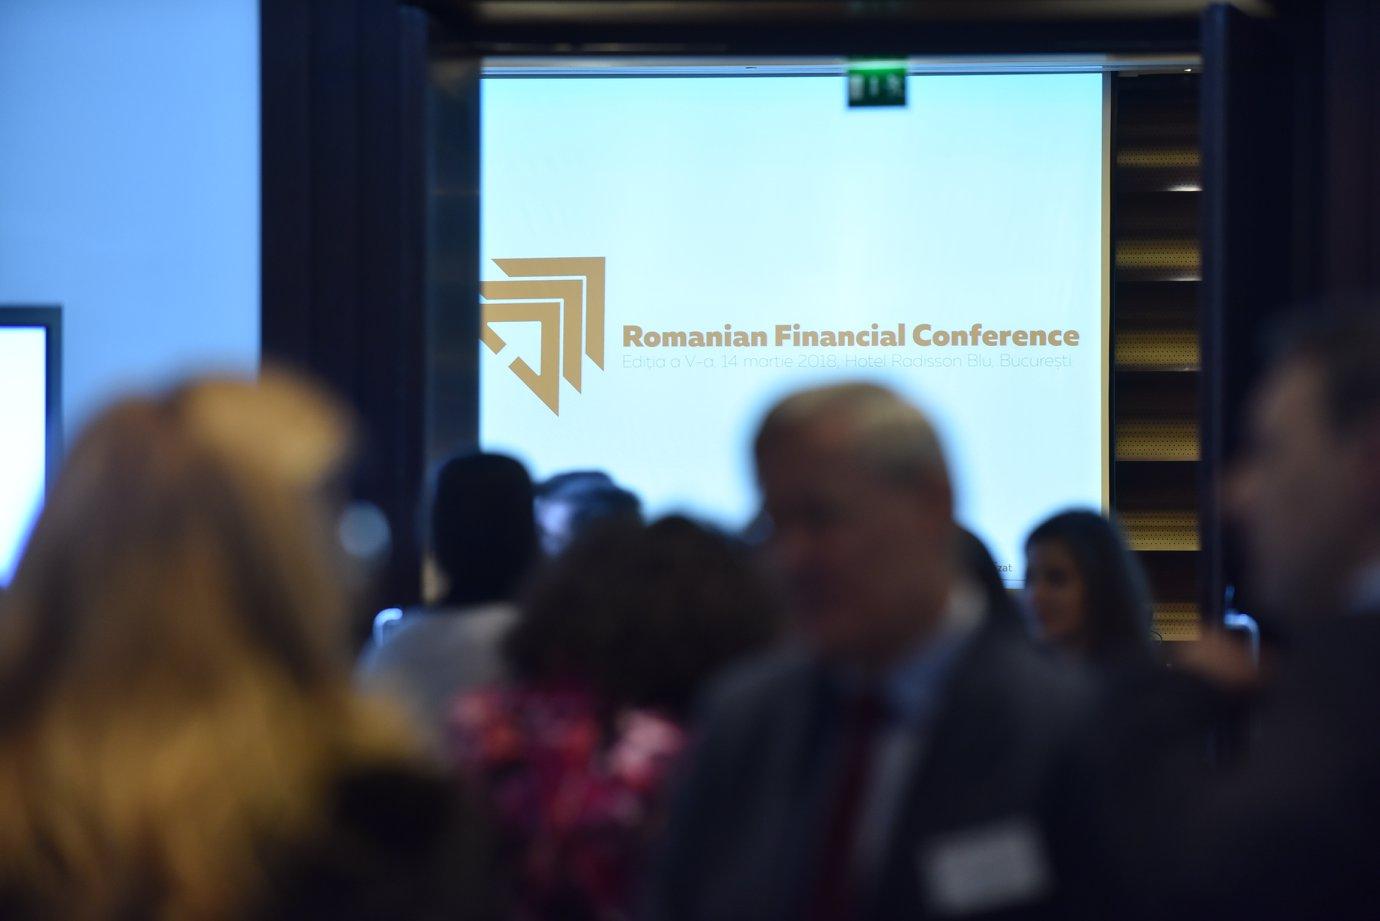 Expertii financiari discuta la cea de-a VI-a editie a Romanian Financial Conference